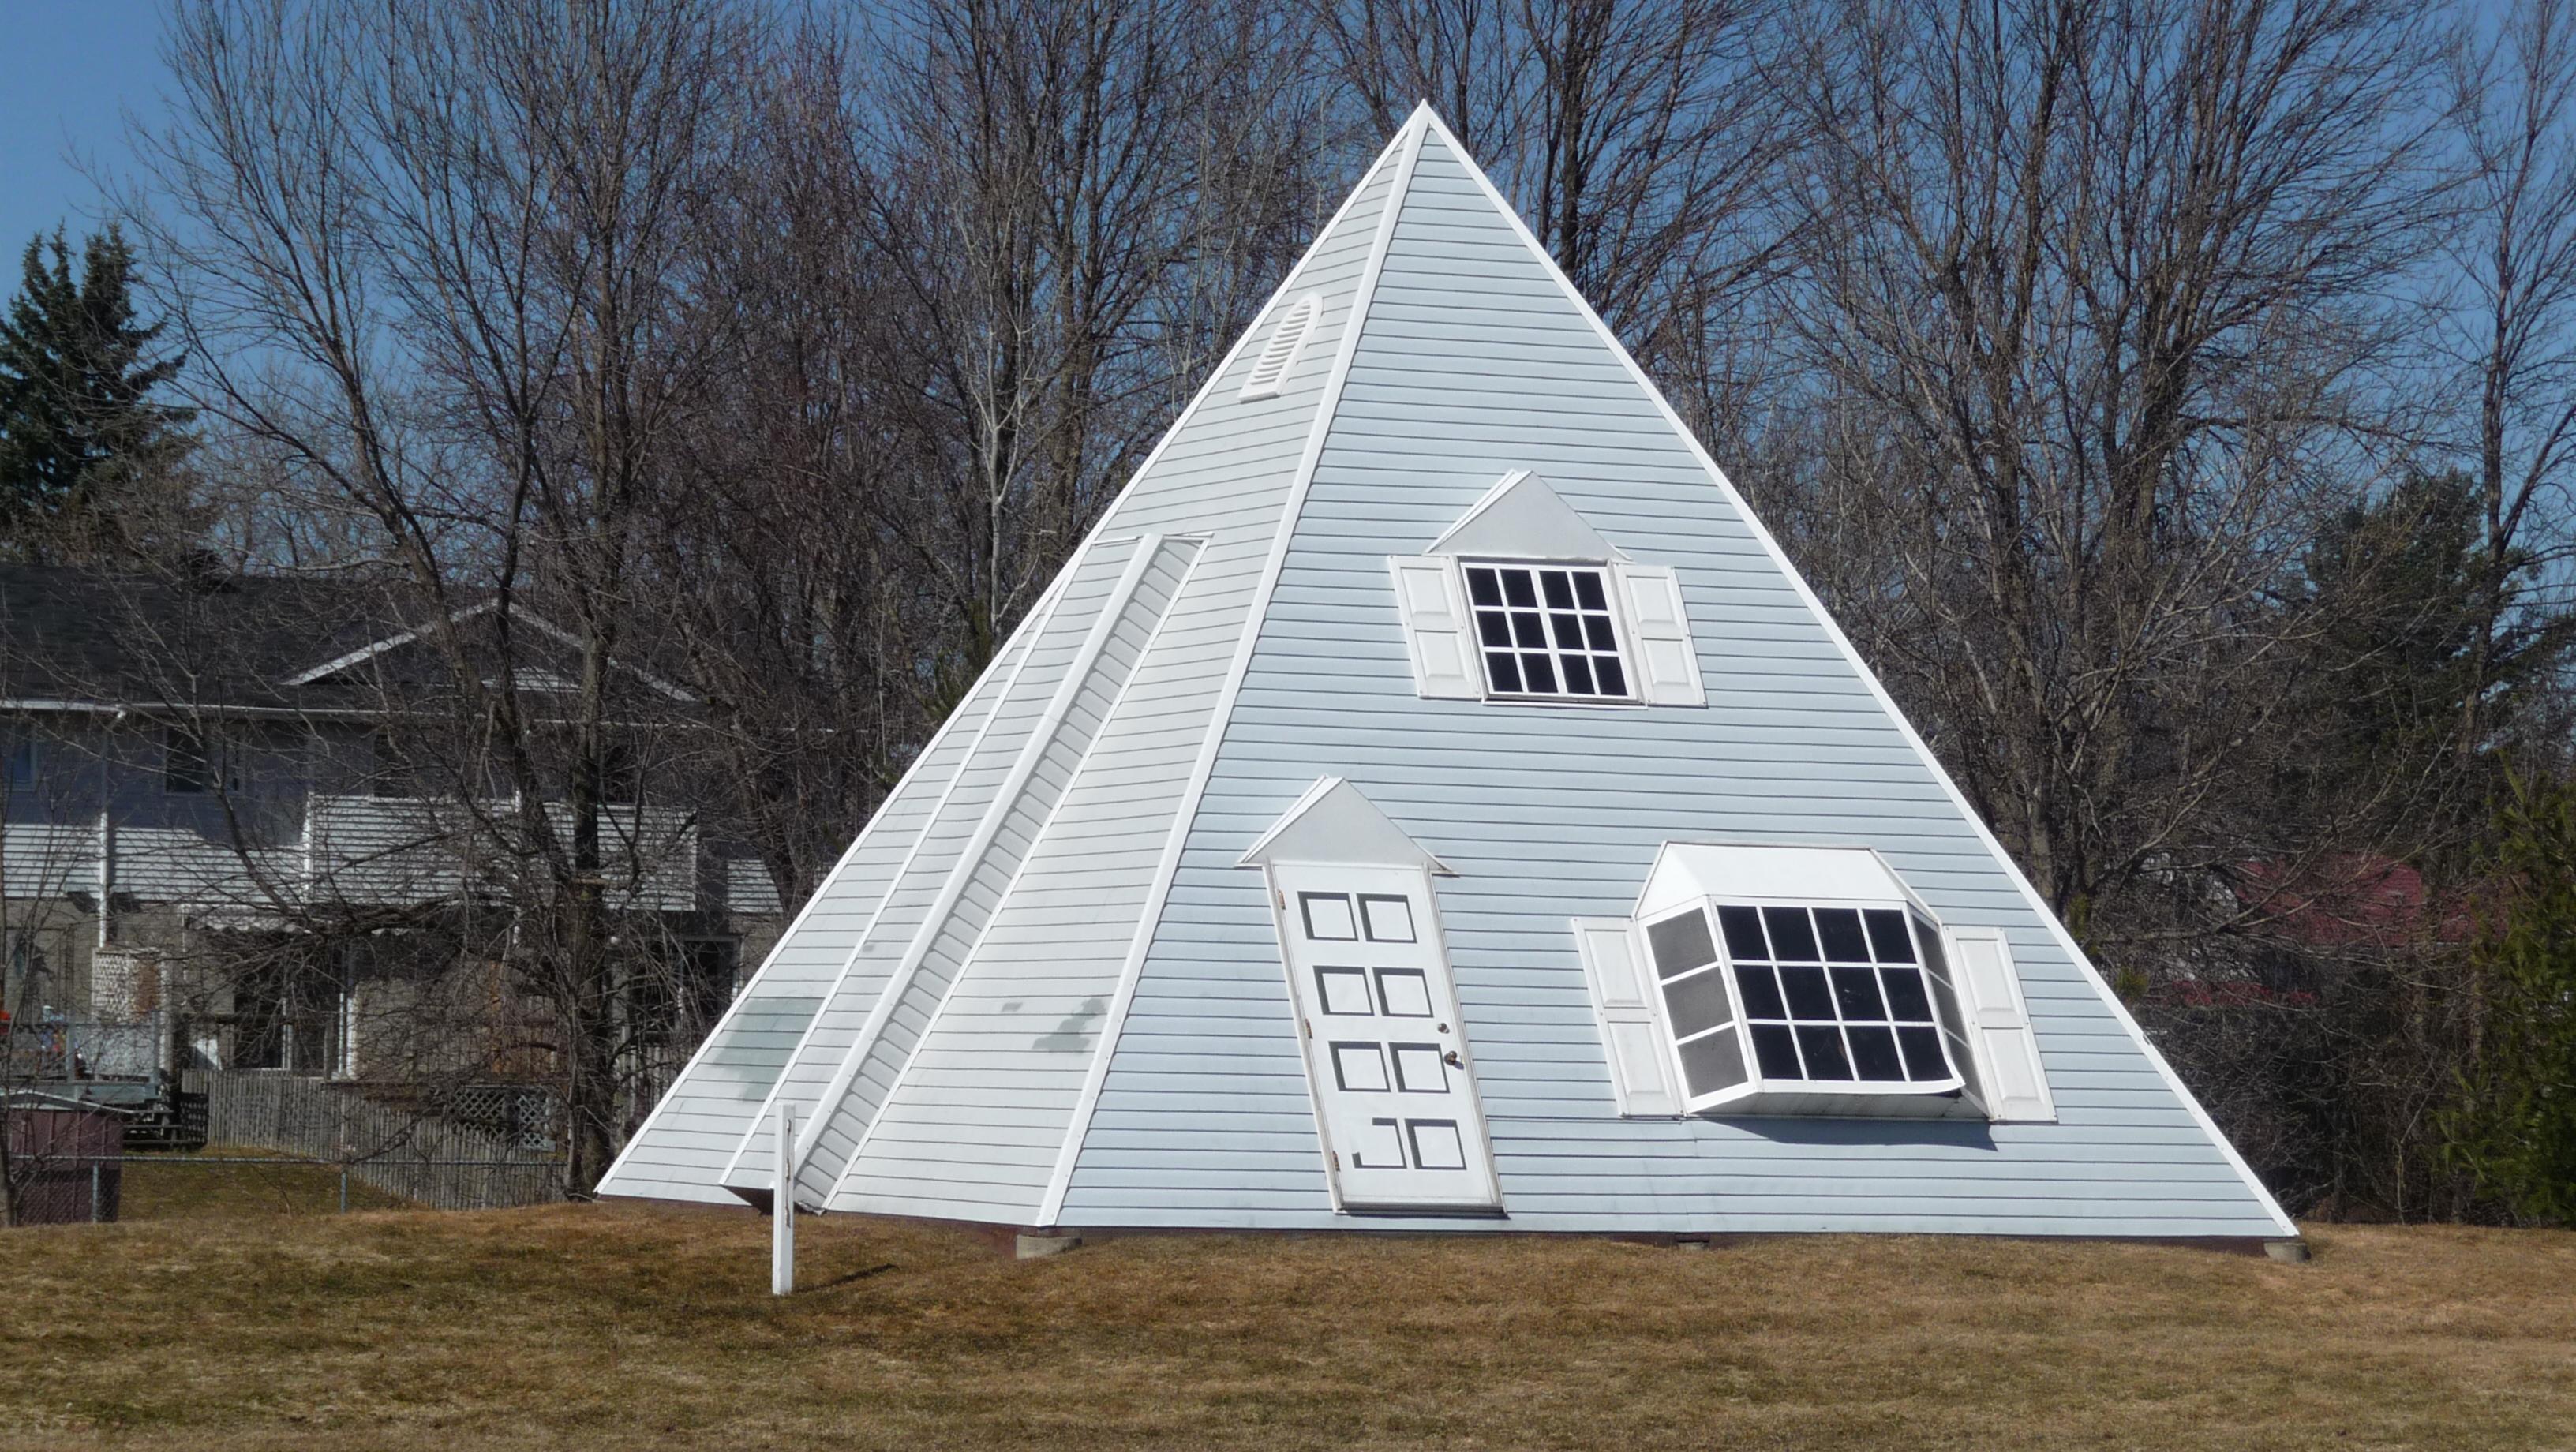 Pyramid House Cornwall Ontario Canada Image